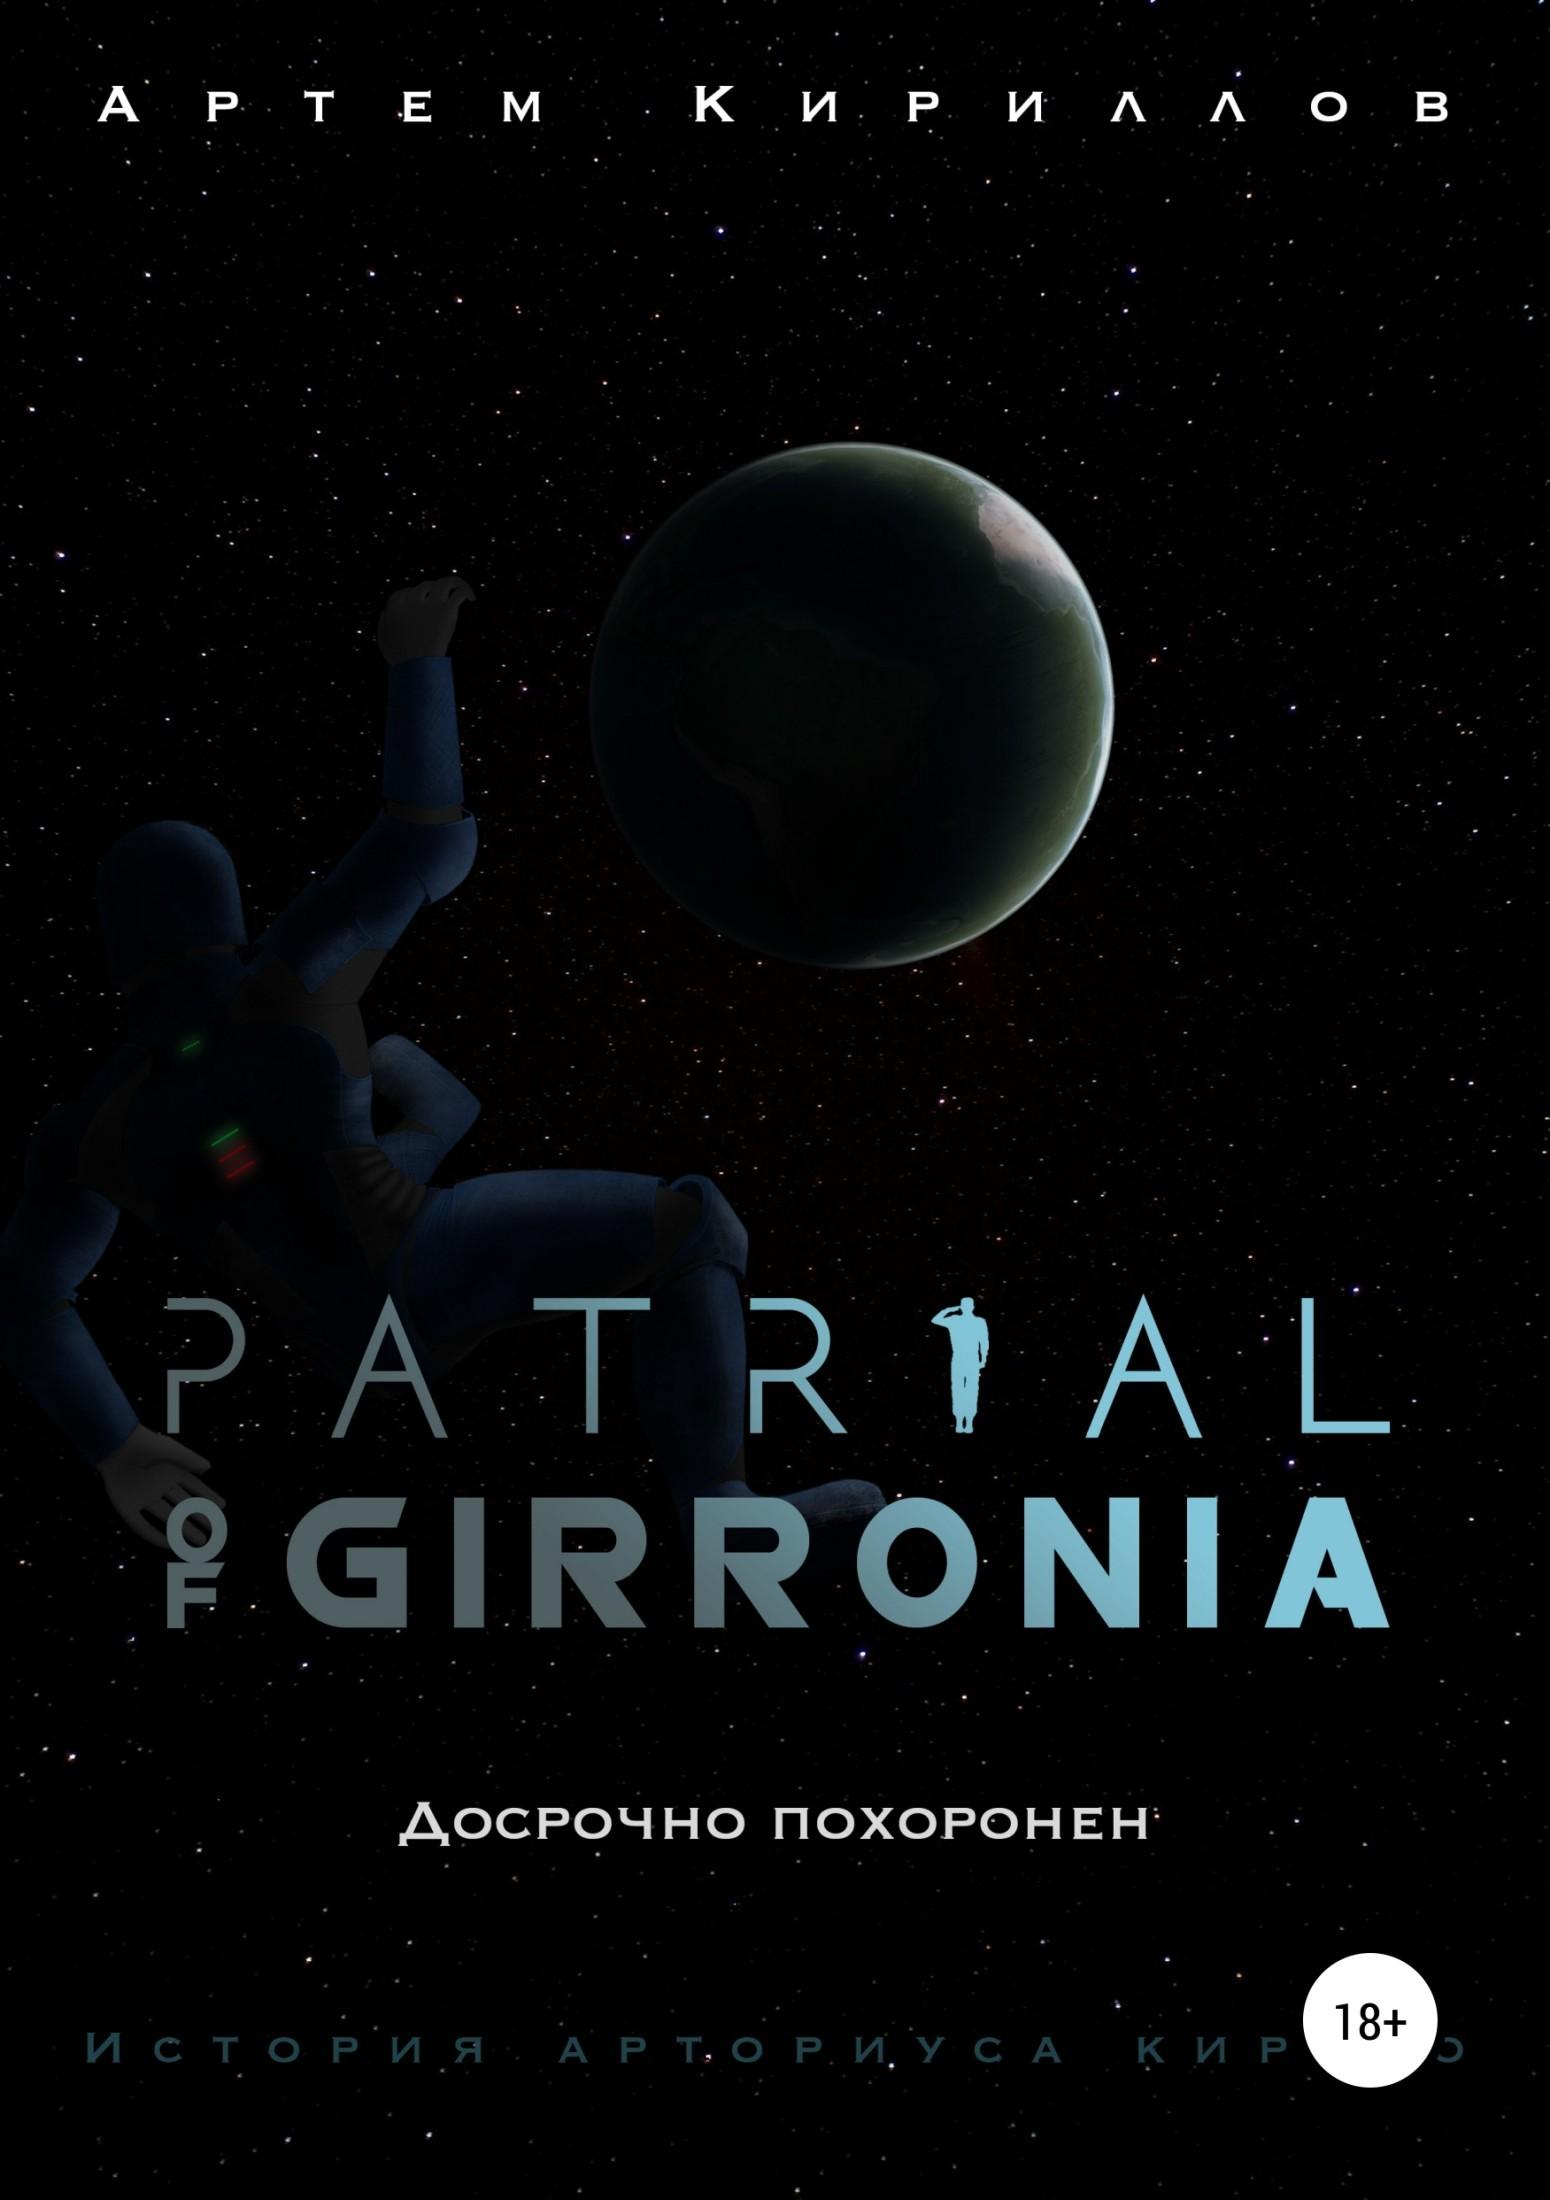 Patrial of Girronia:Досрочно похоронен